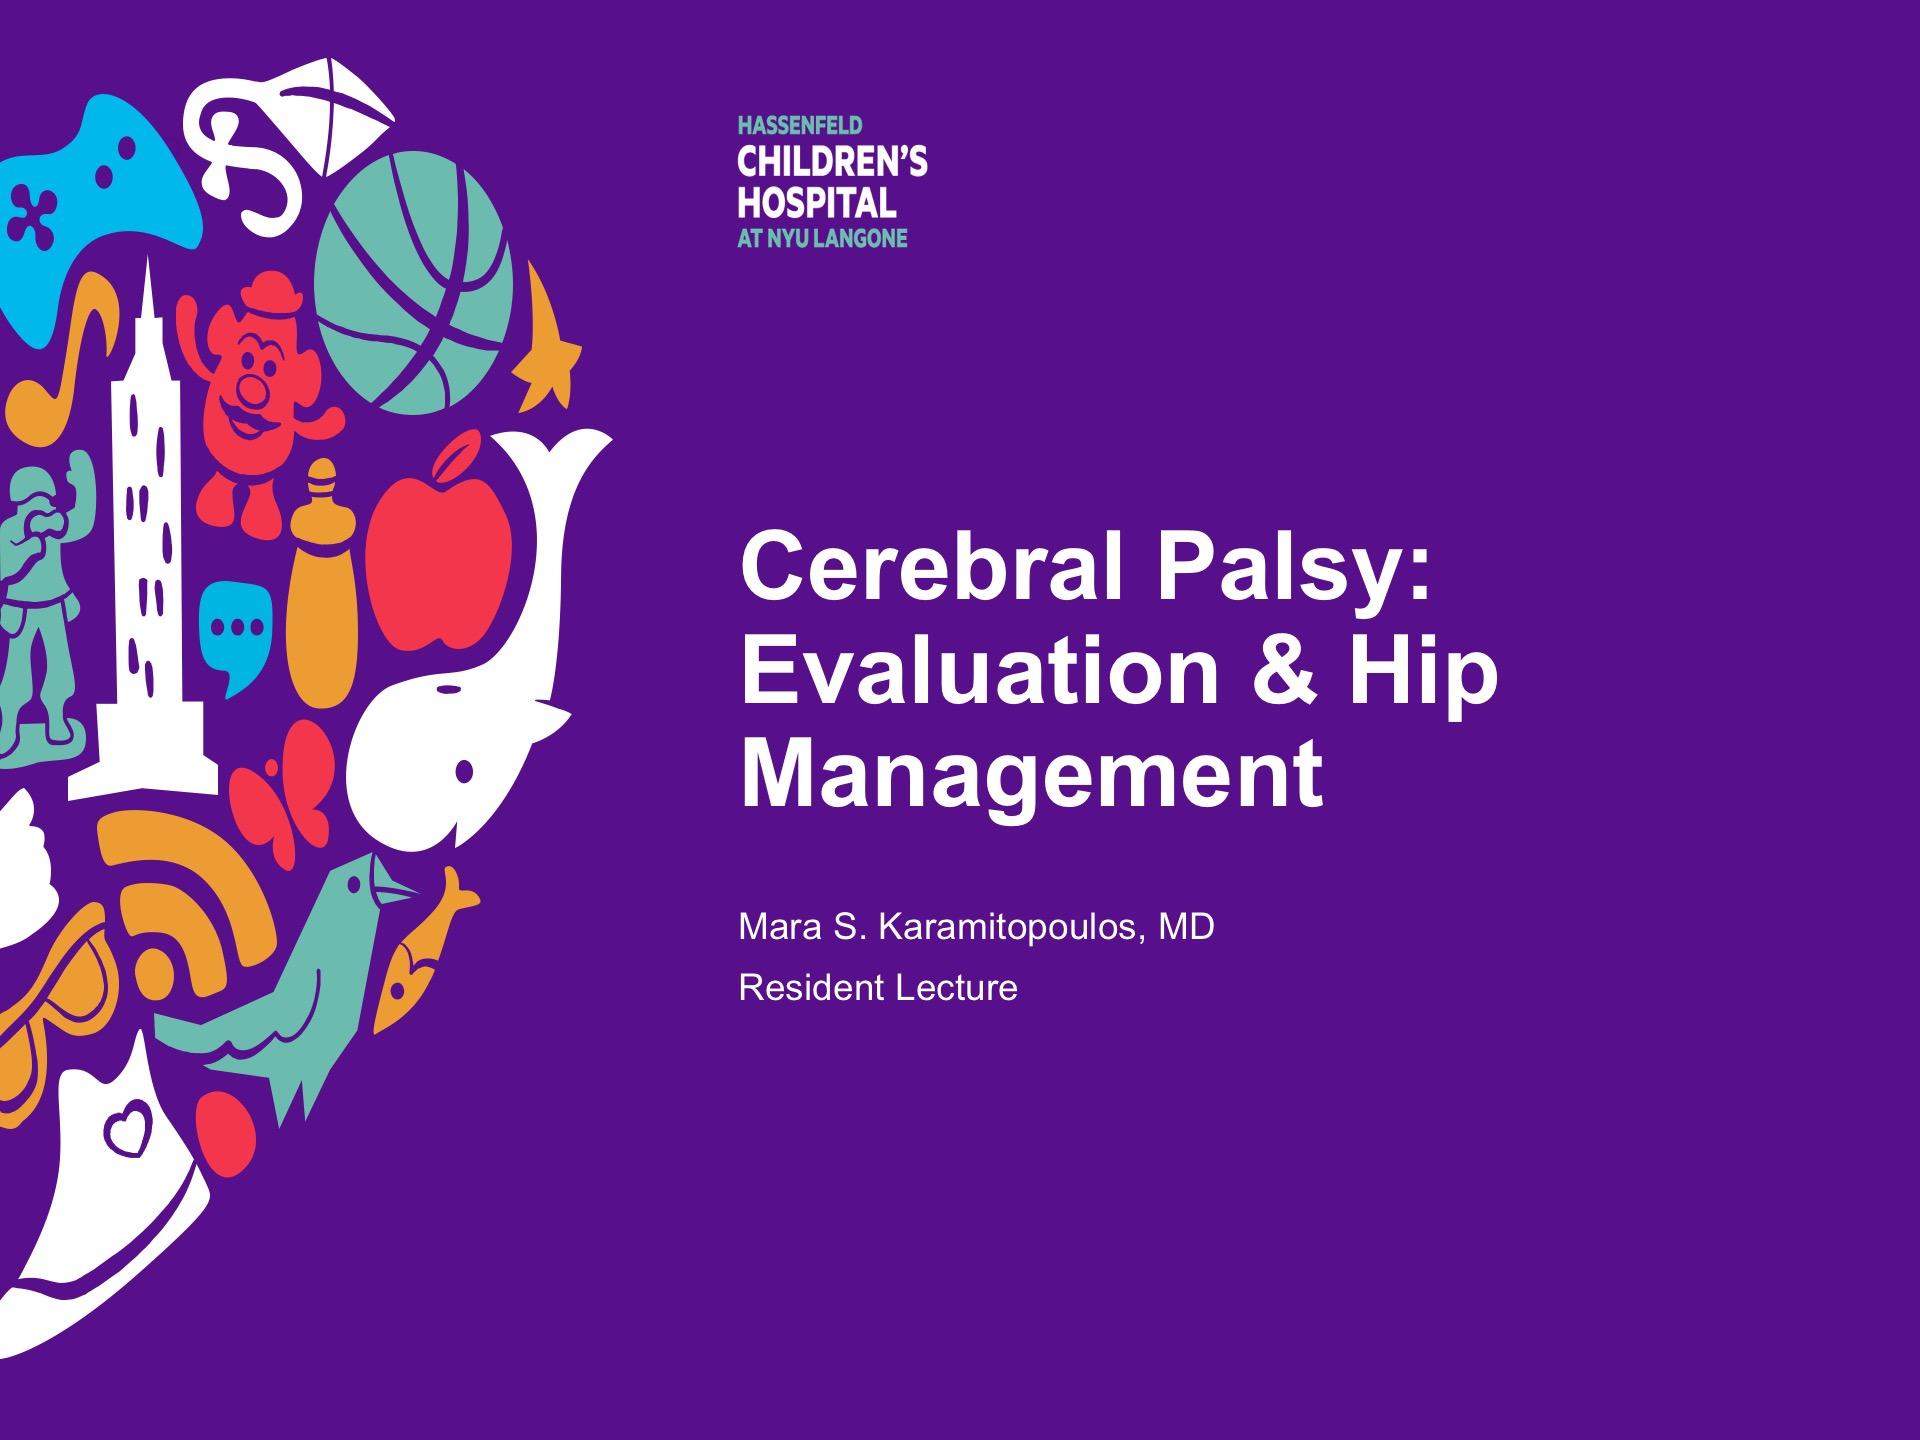 Cerebral Palsy Evaluation and Hip Management